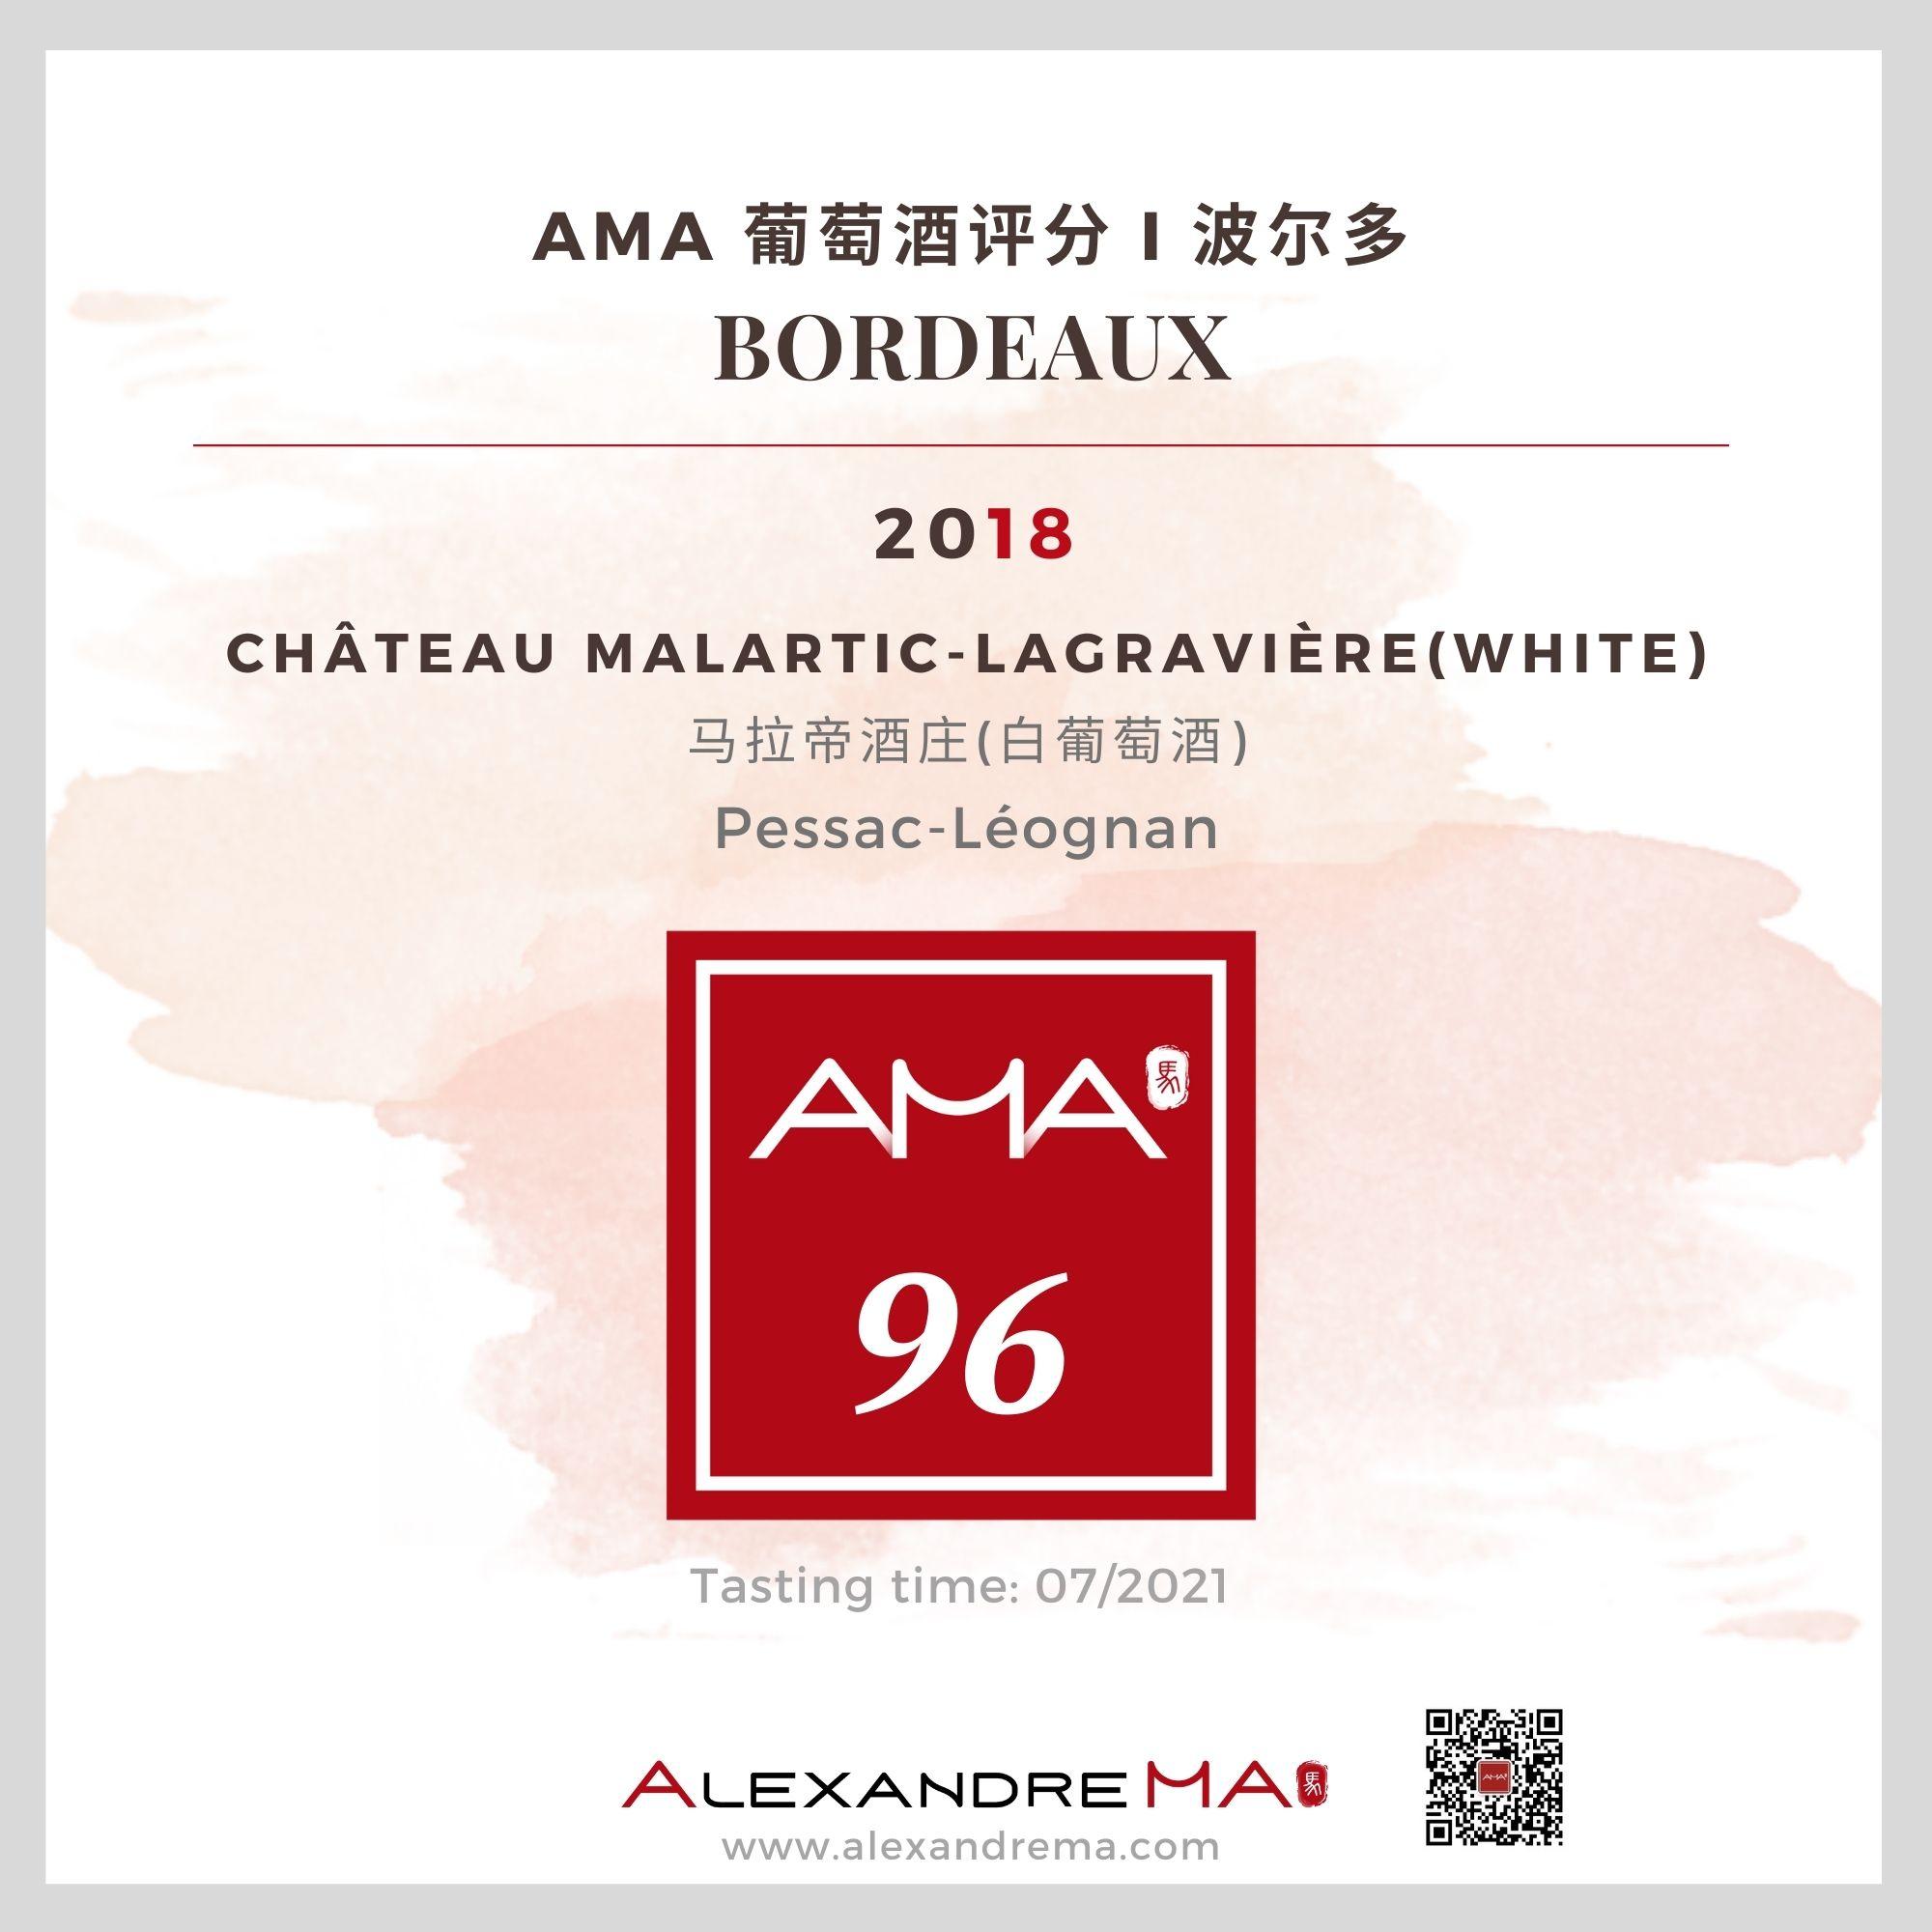 Château Malartic-Lagravière White 2018 马拉帝酒庄 - Alexandre Ma